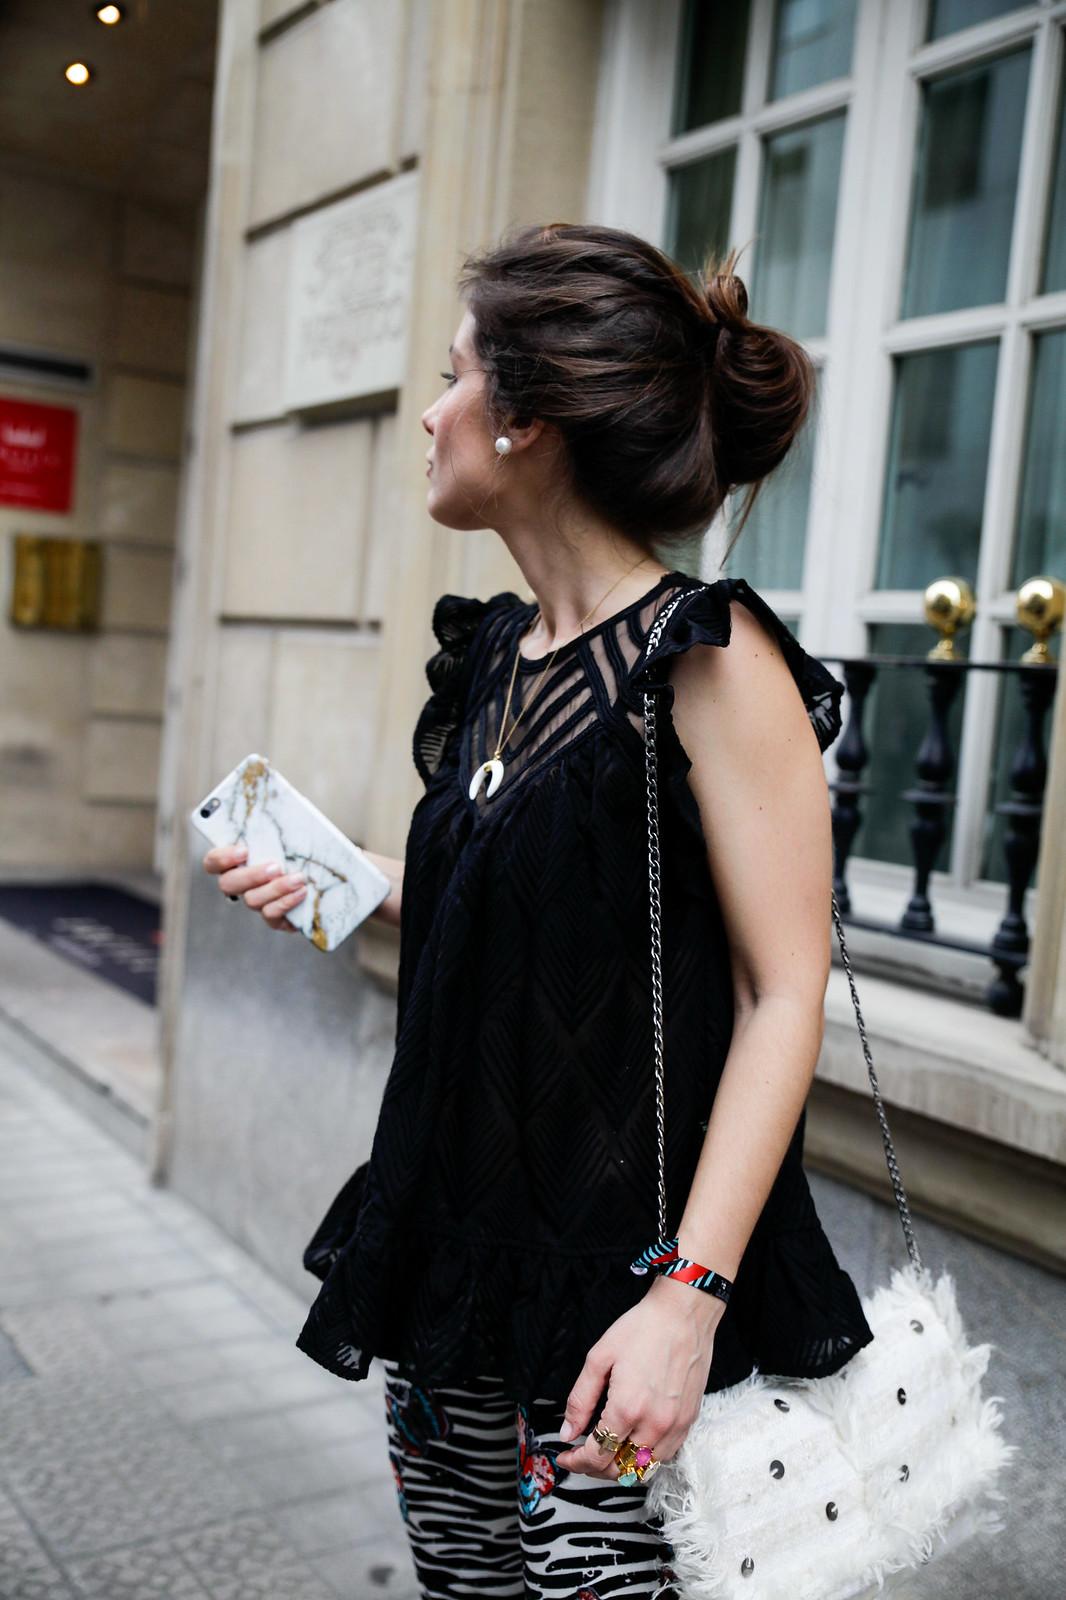 01_Pantalones_Zebra_Blusa_Boho_tacones_rosas_stradivarius_Theguestgirl_outfit_barcelona_streetstyle